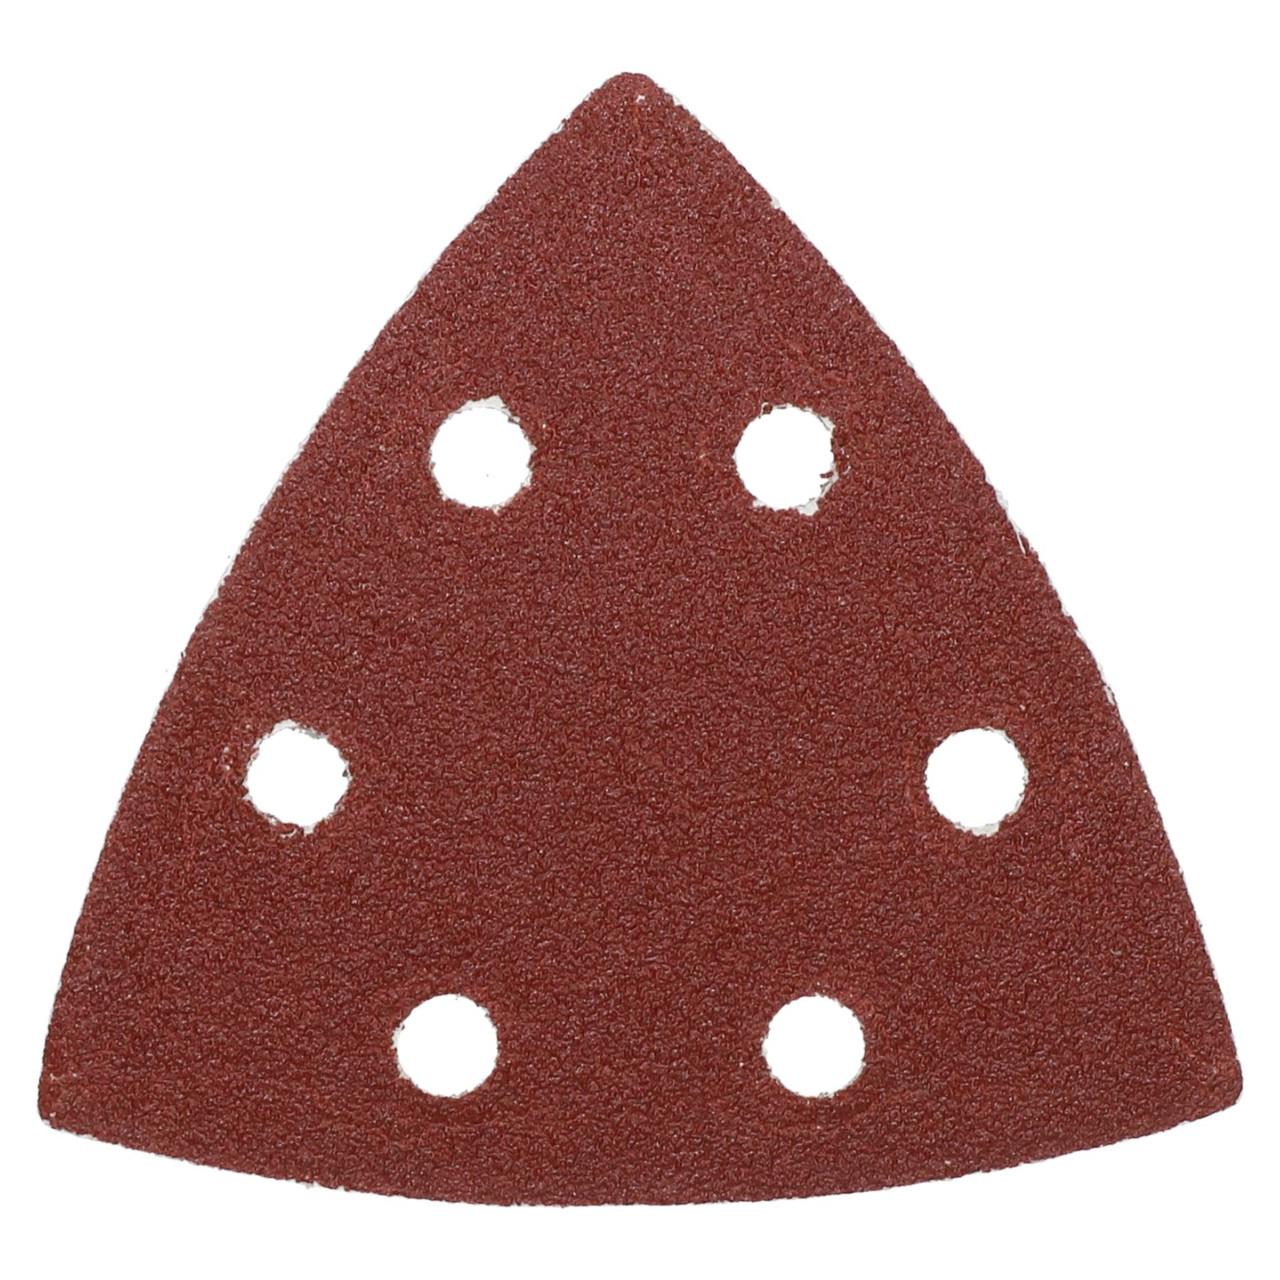 Hook Loop Delta Sanding Abrasive Discs Pads 93mm Triangle 80 Grit Medium 5pc